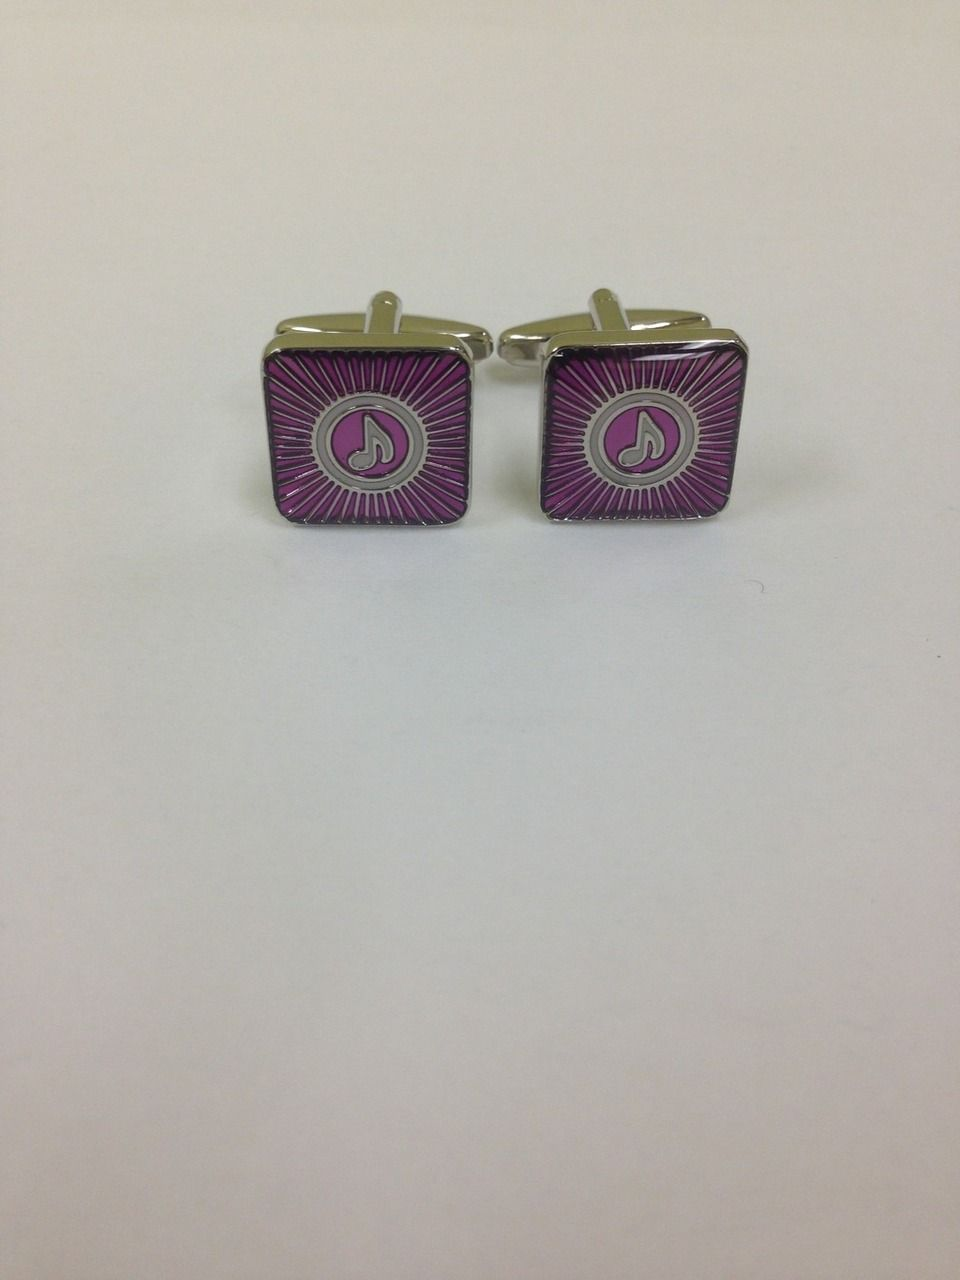 2 Pc. Gospel Tunes Fusion Purple Cufflinks